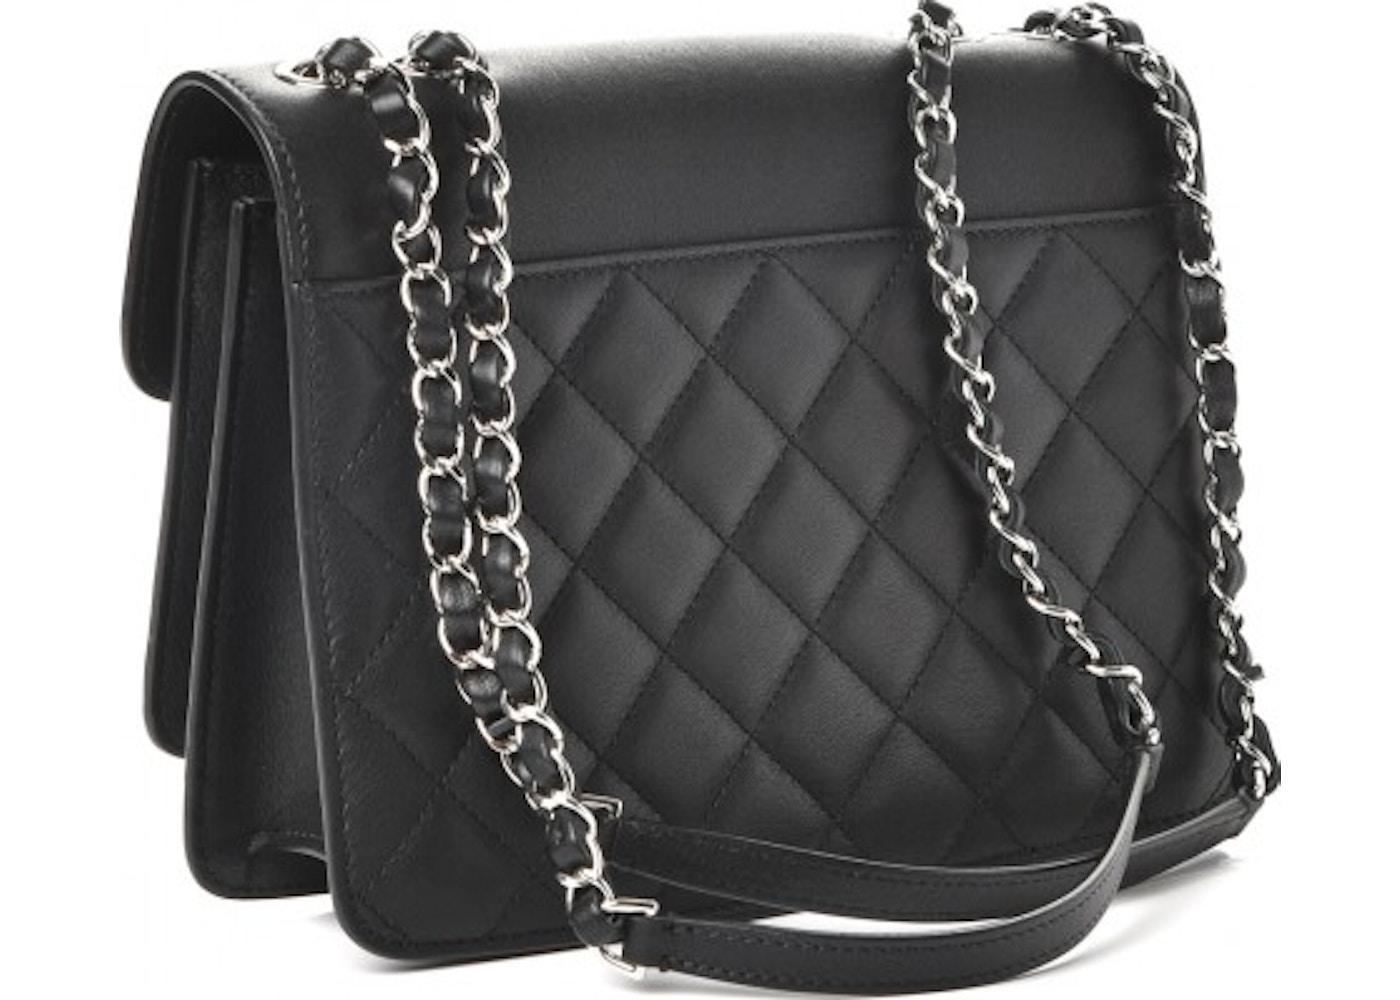 d9135e5f2d46 Chanel Urban Companion Flap Quilted Diamond Mini Black